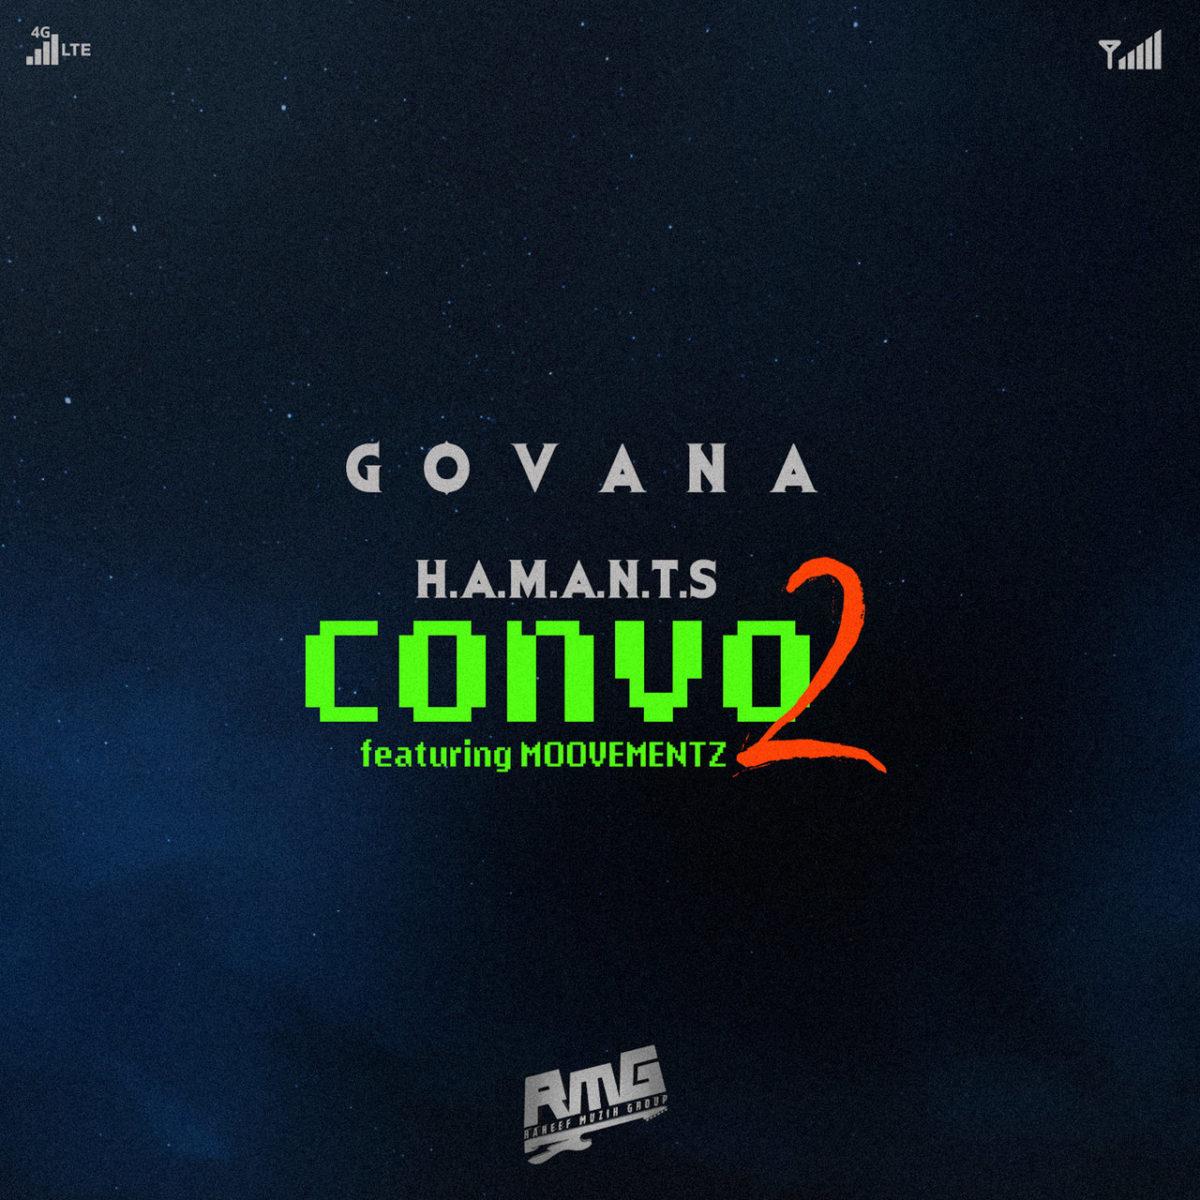 Govana - Hamants Convo 2 (ft. Moovementz) (Cover)